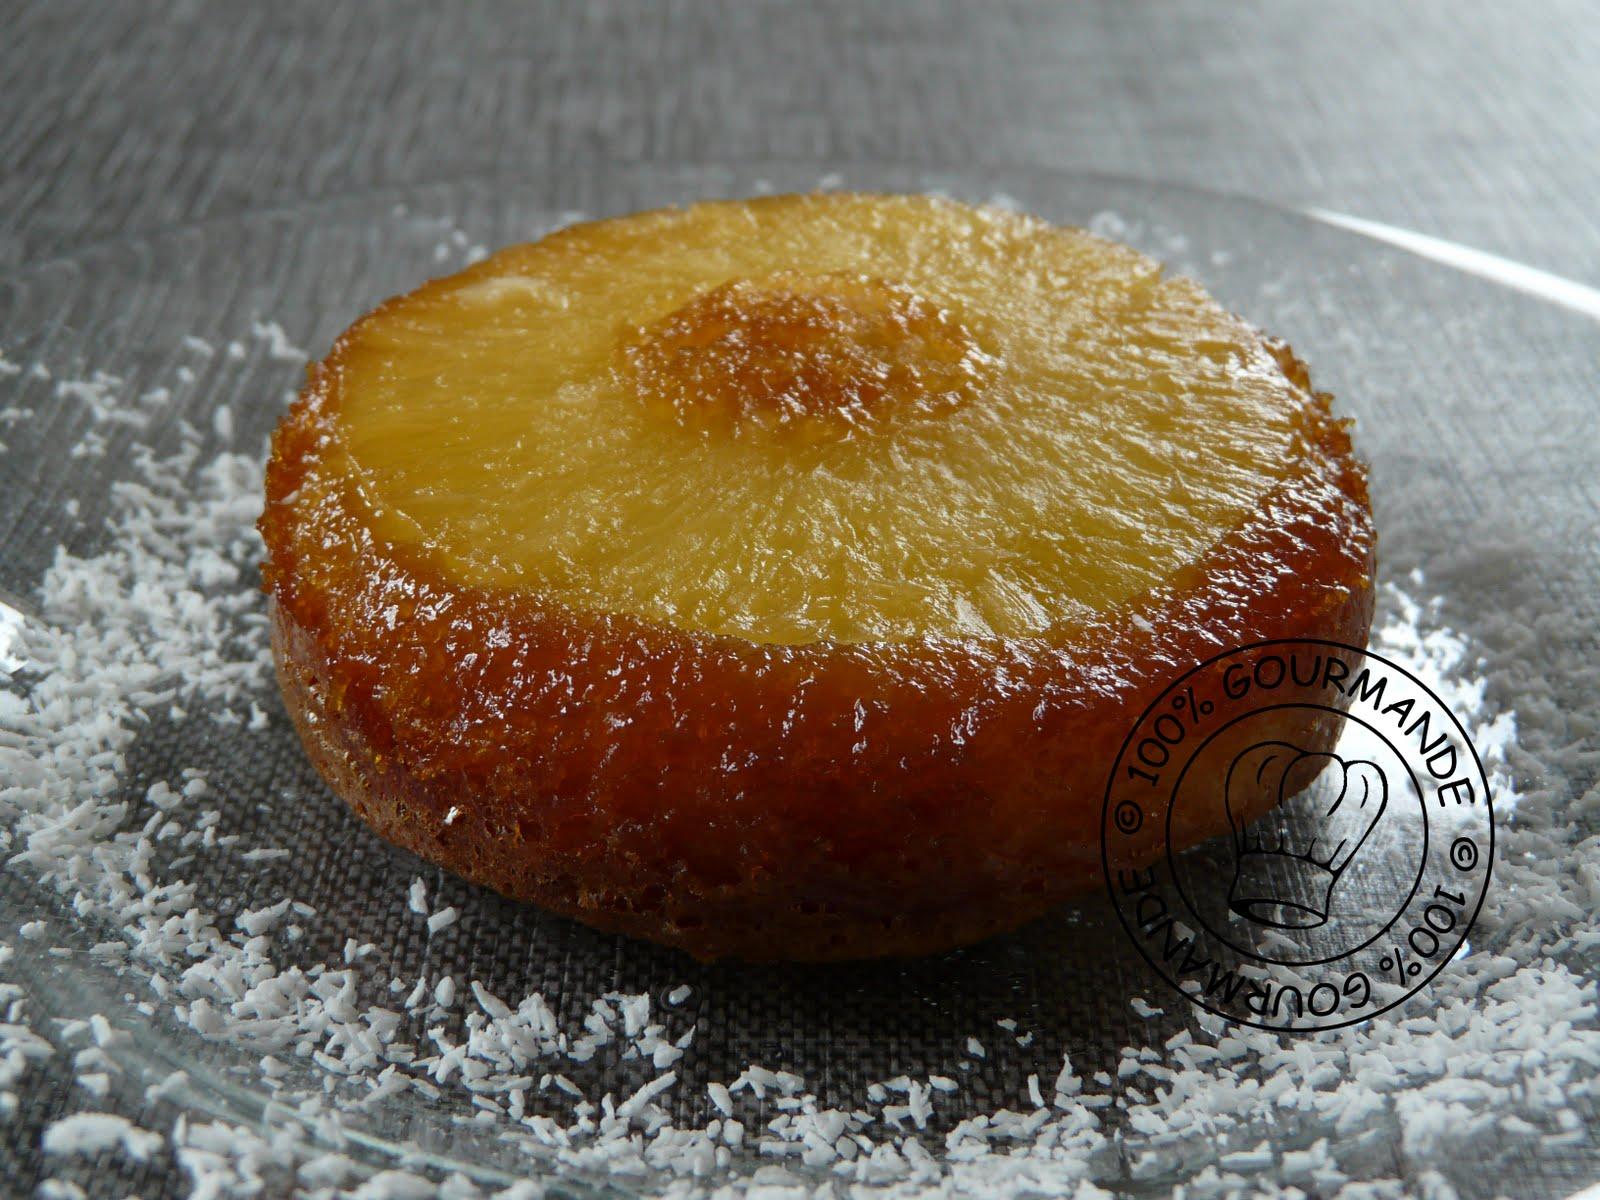 Gateau ananas caramel individuel  renversant .